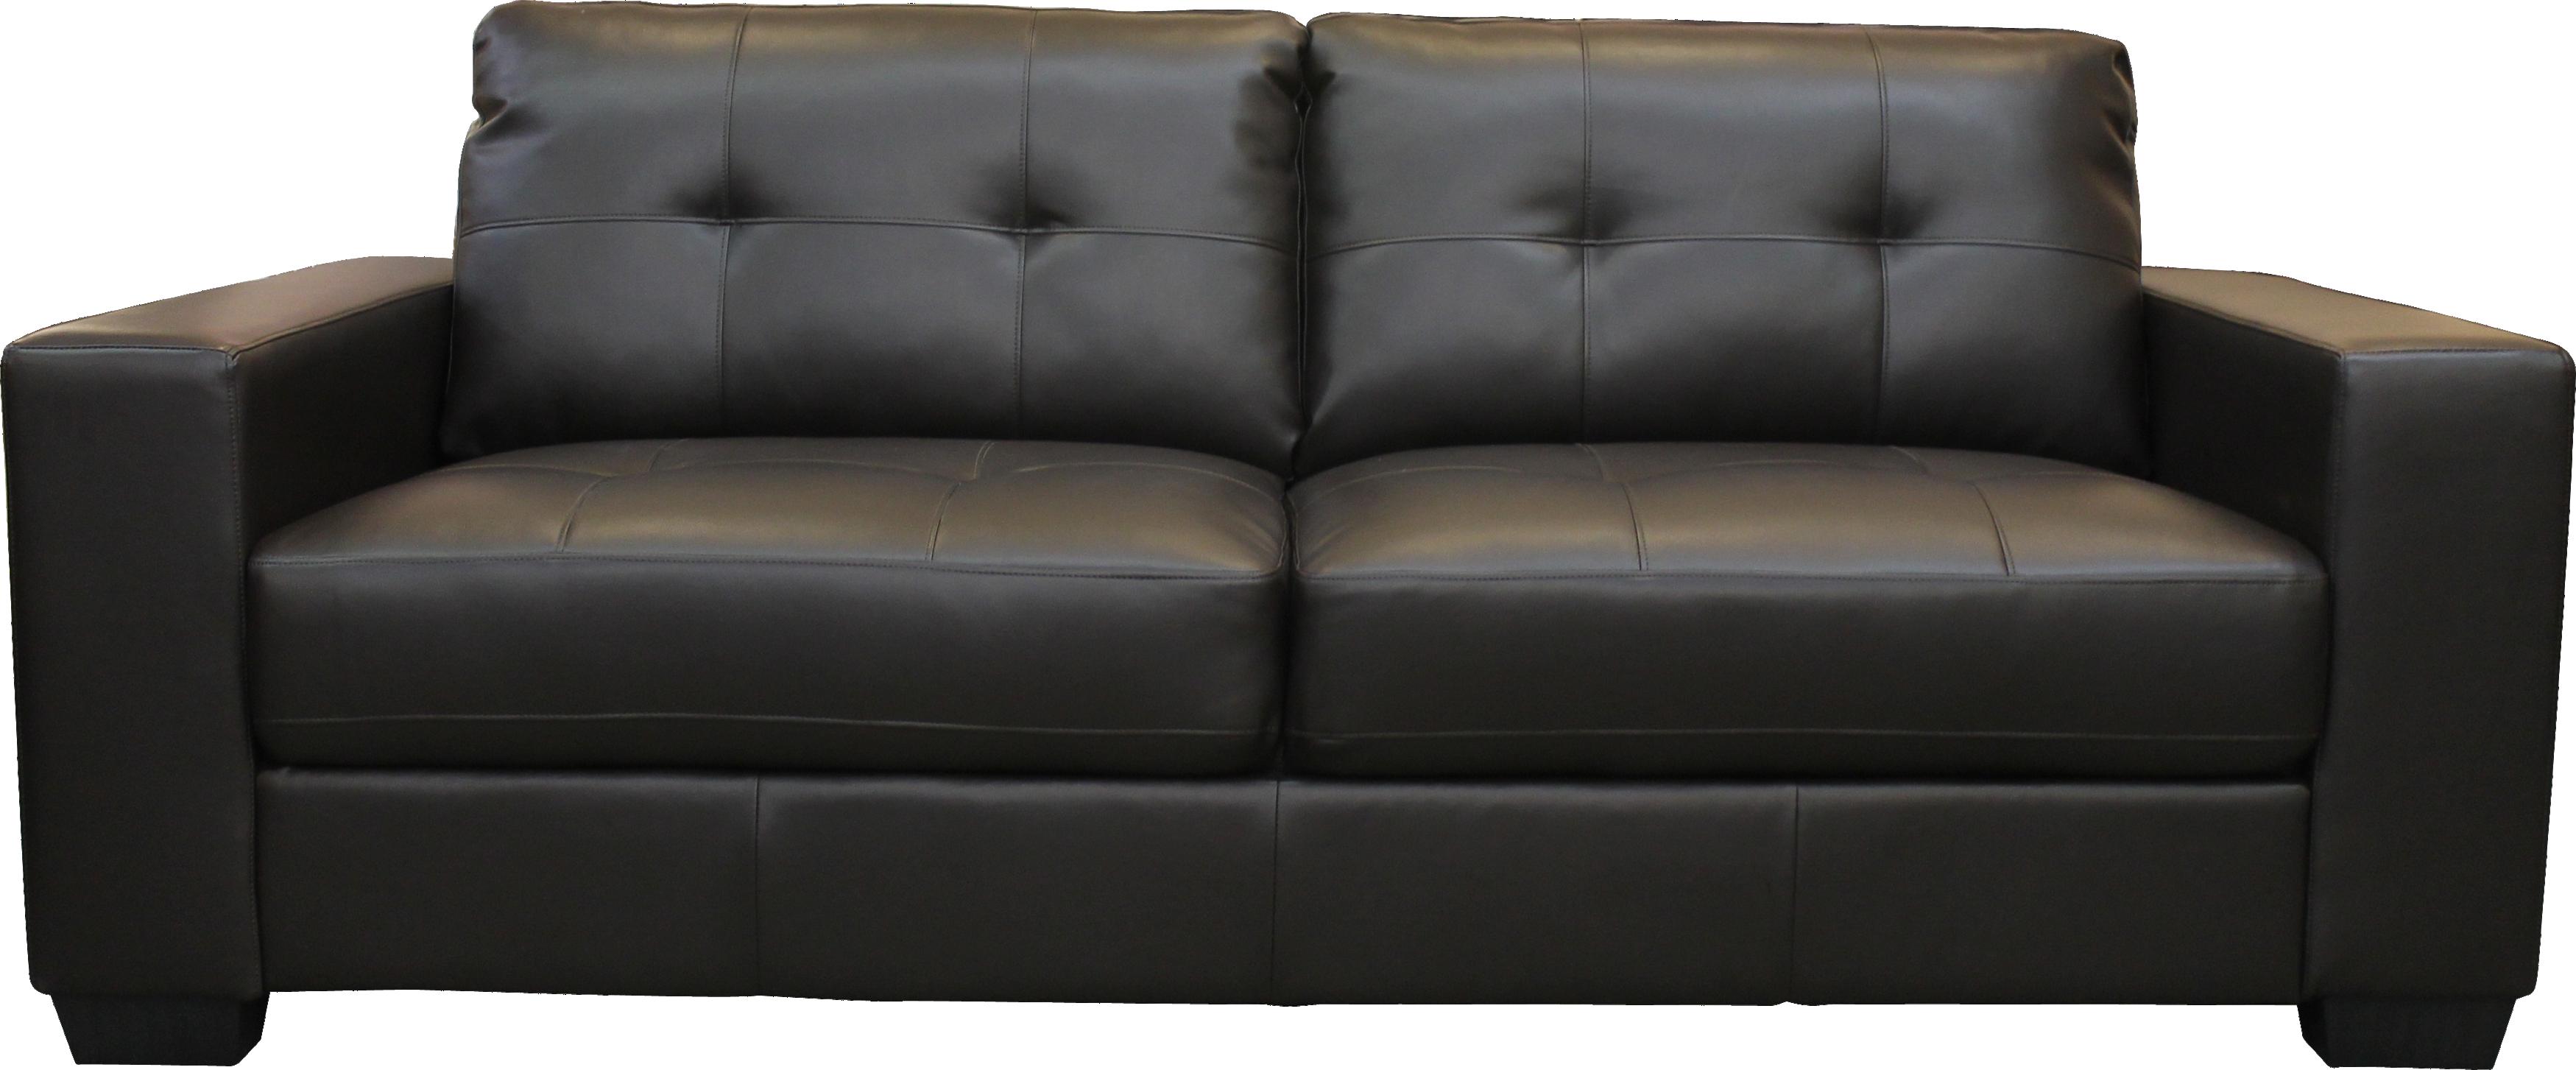 Sofa Png Image - Sofa, Transparent background PNG HD thumbnail